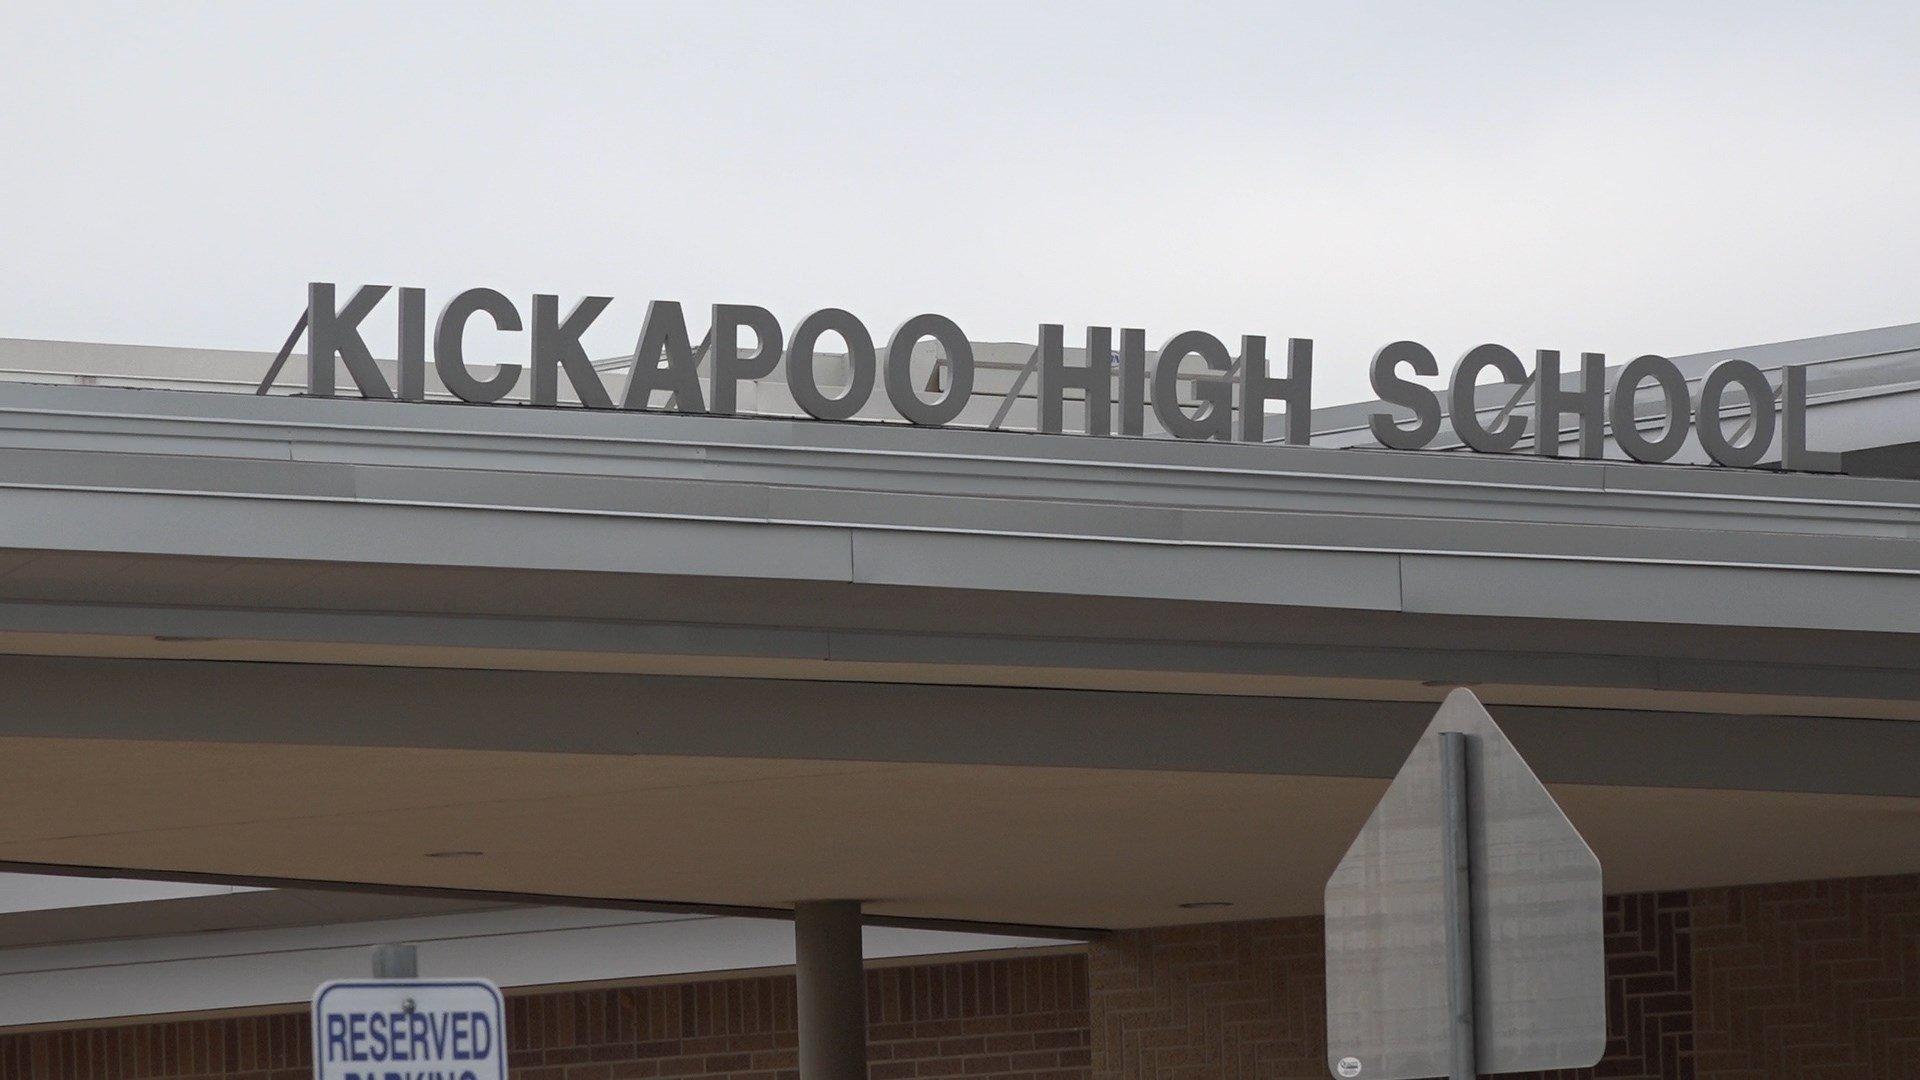 Kickapoo Hd